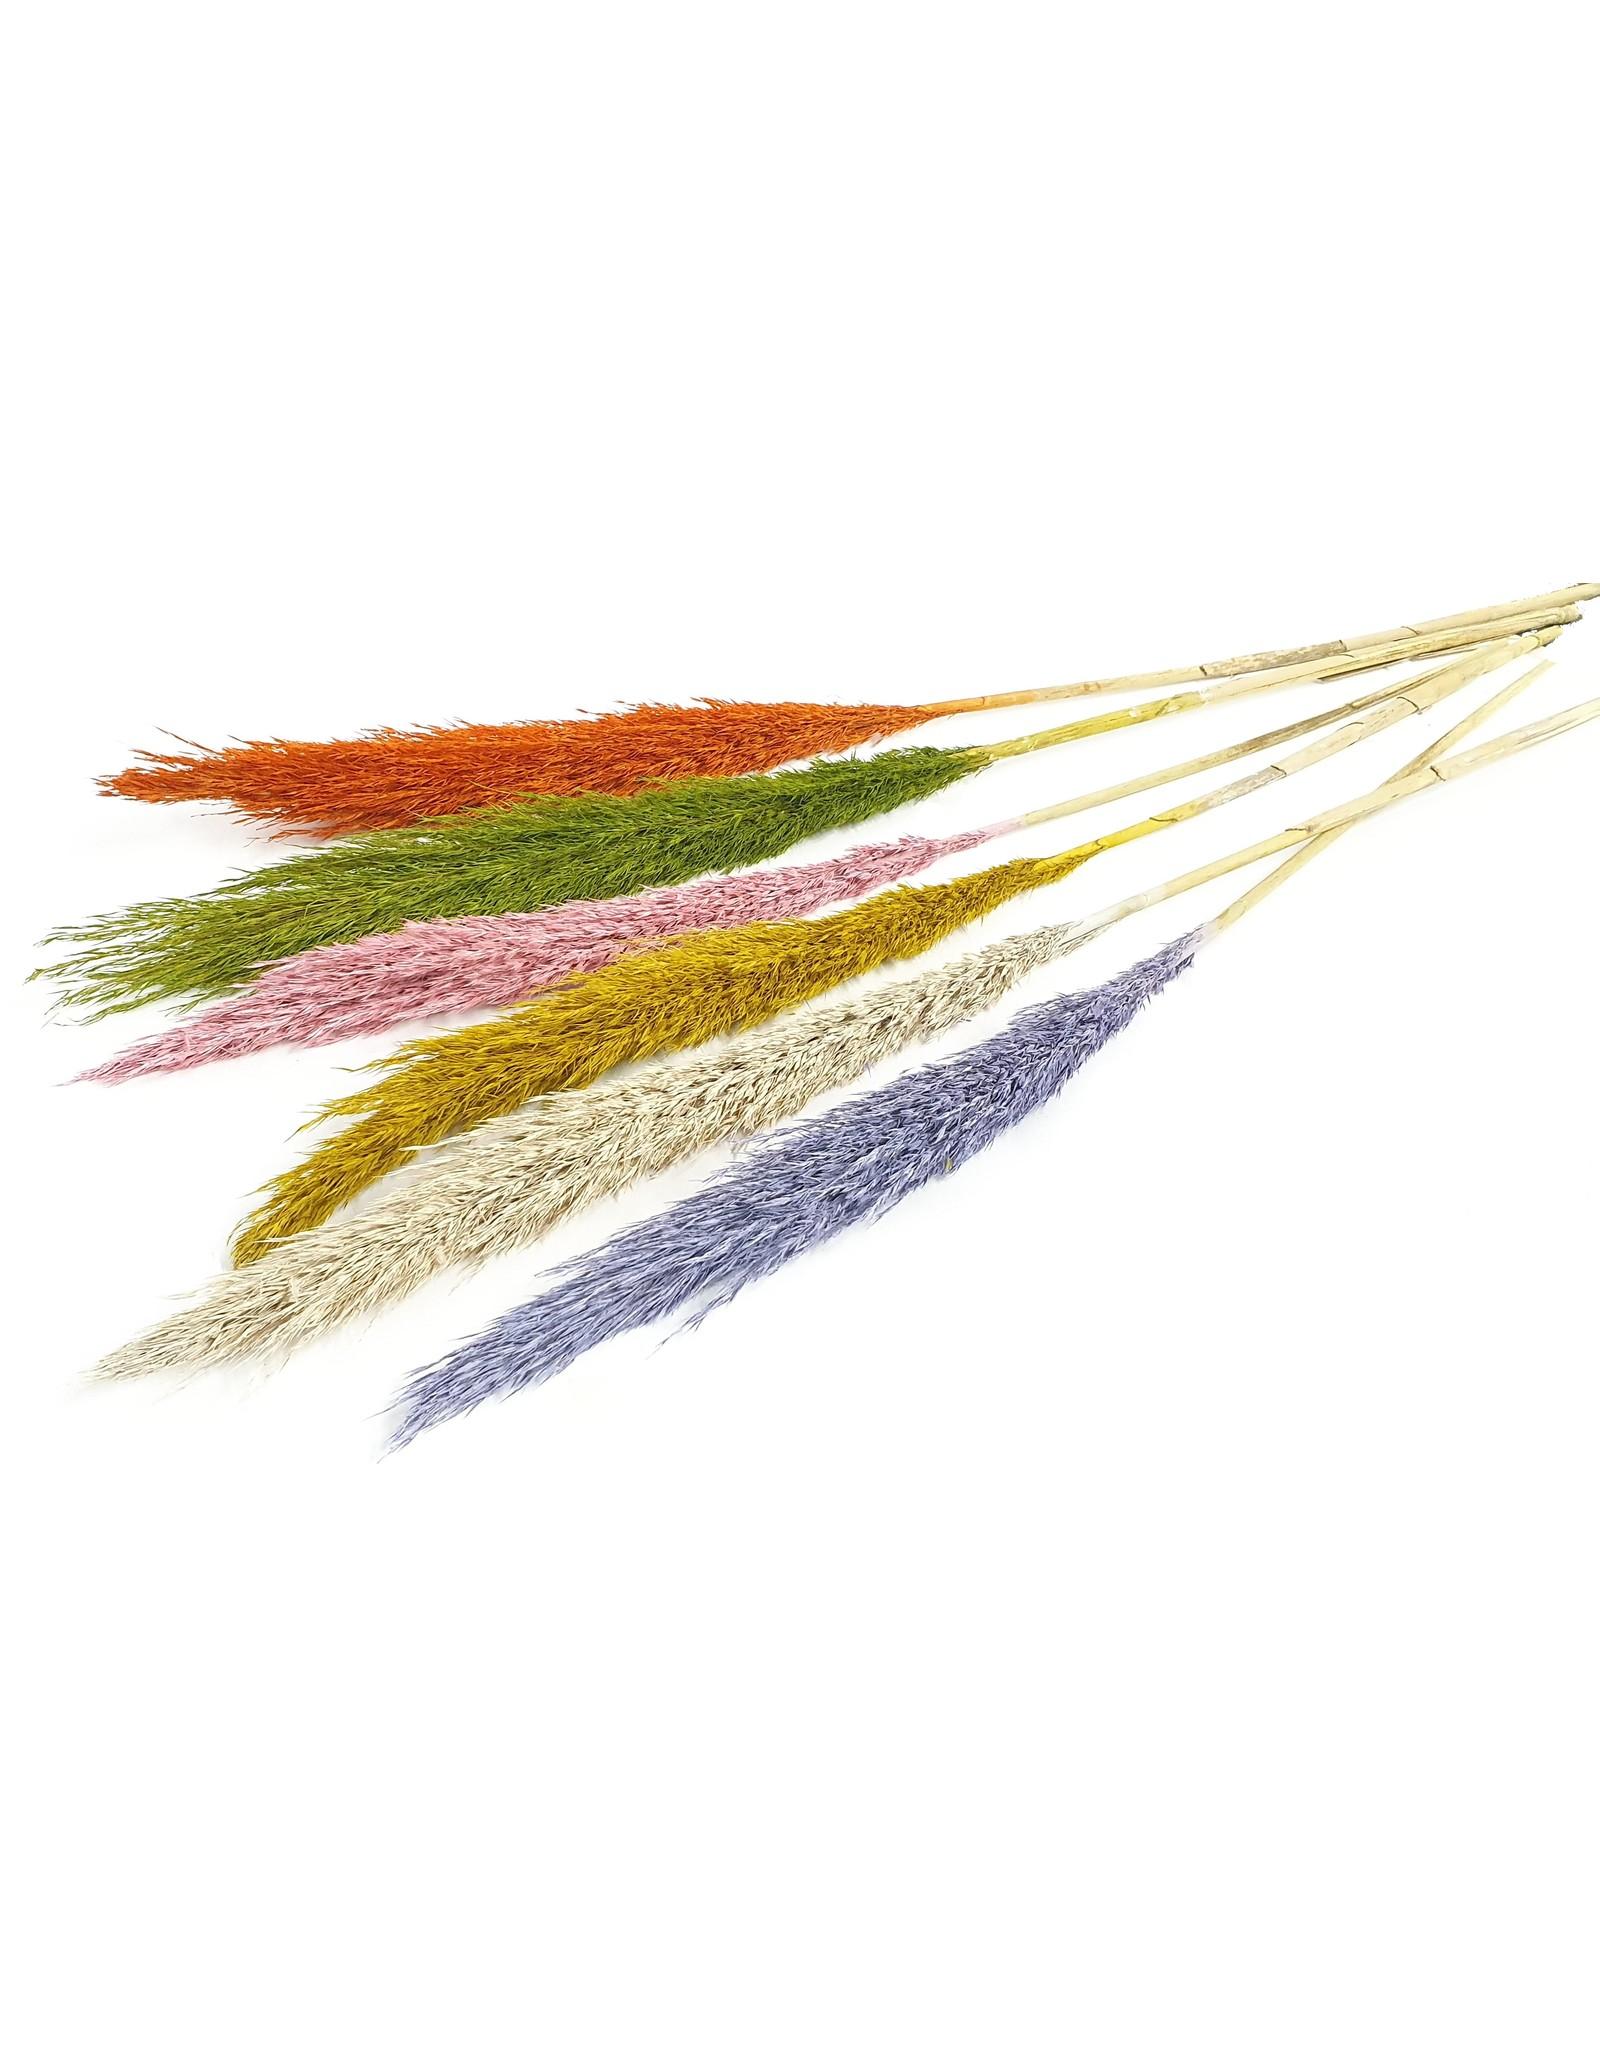 Cane Arundo 125cm per stem Mixed colours x 60